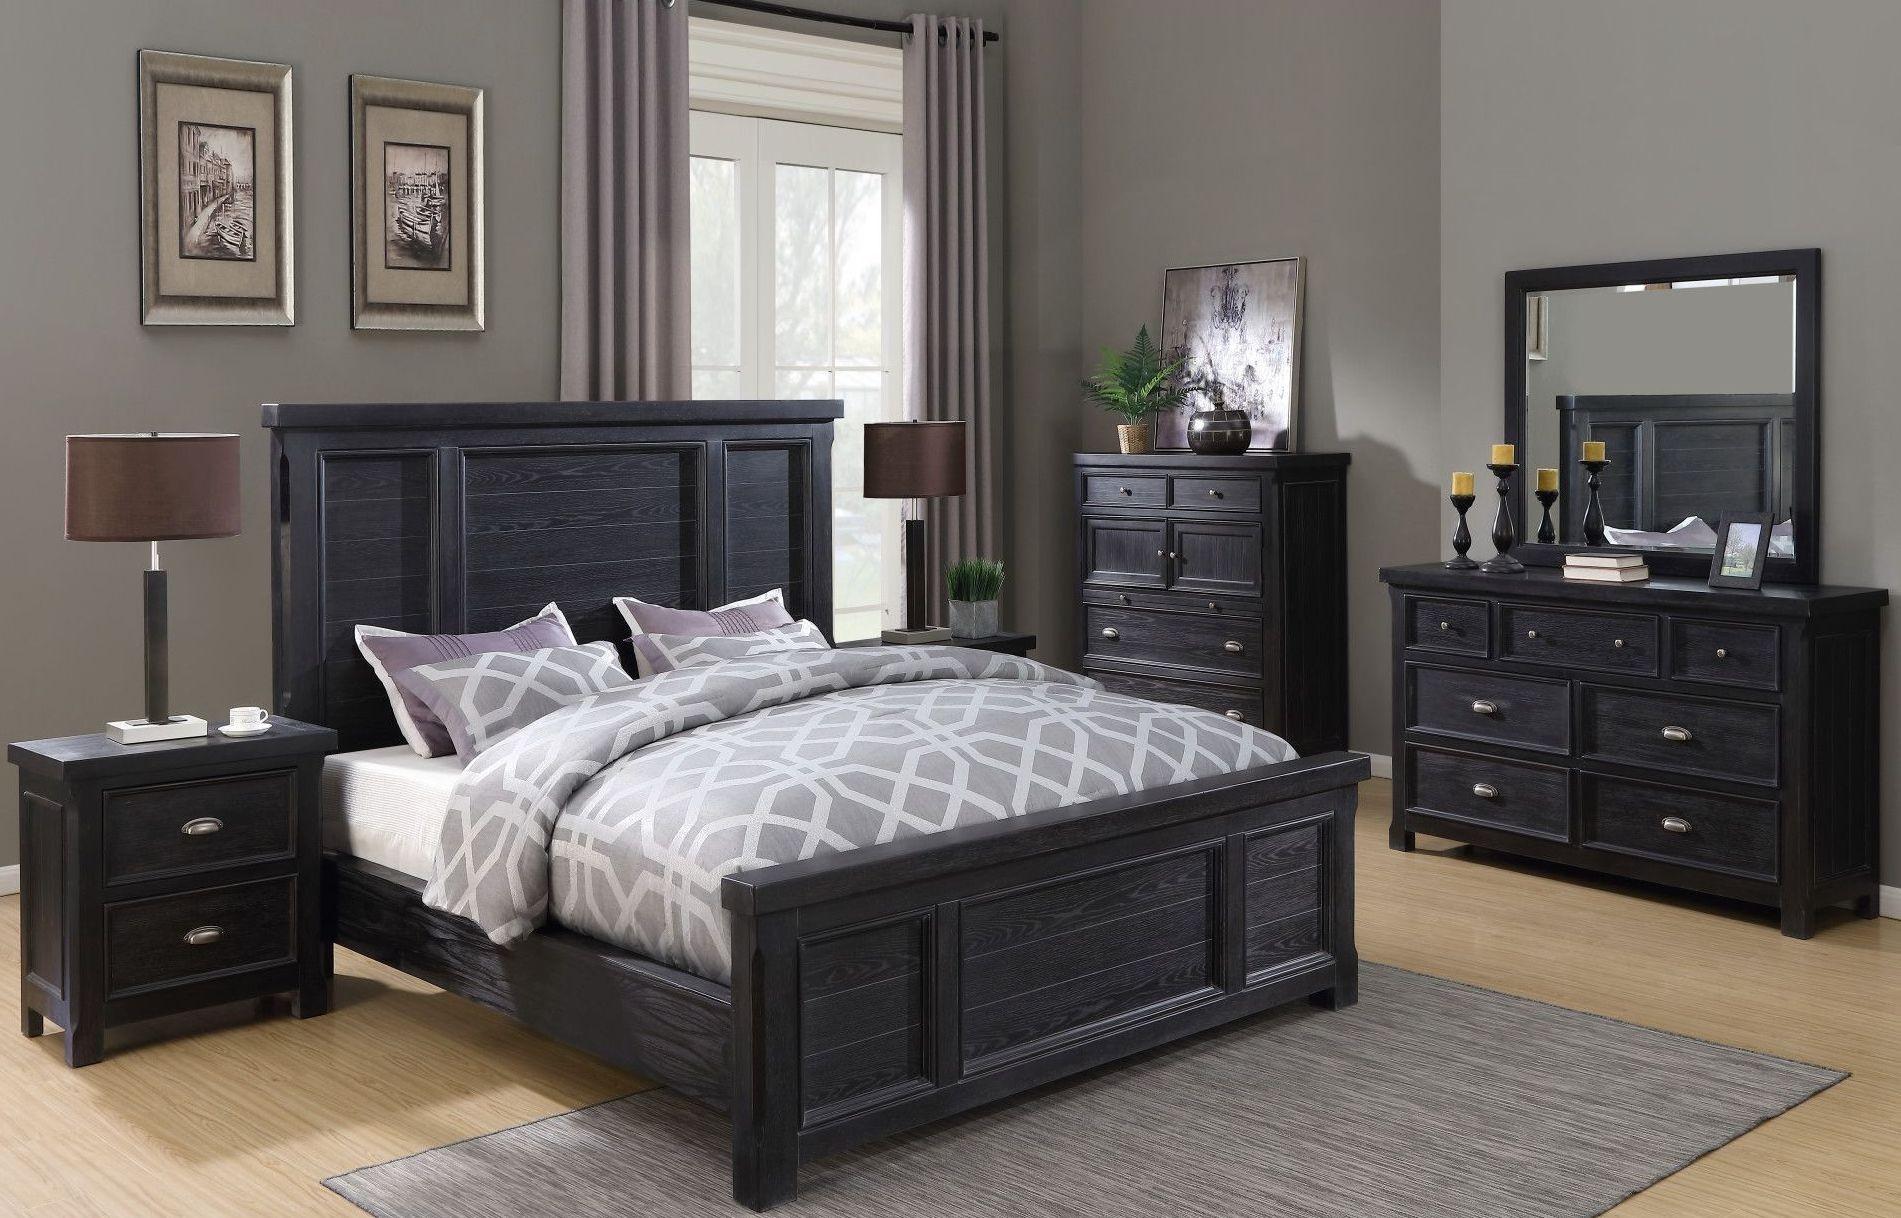 warwick cracked pepper panel bedroom set b836 10 k b836 04 emerald home furnishings. Black Bedroom Furniture Sets. Home Design Ideas